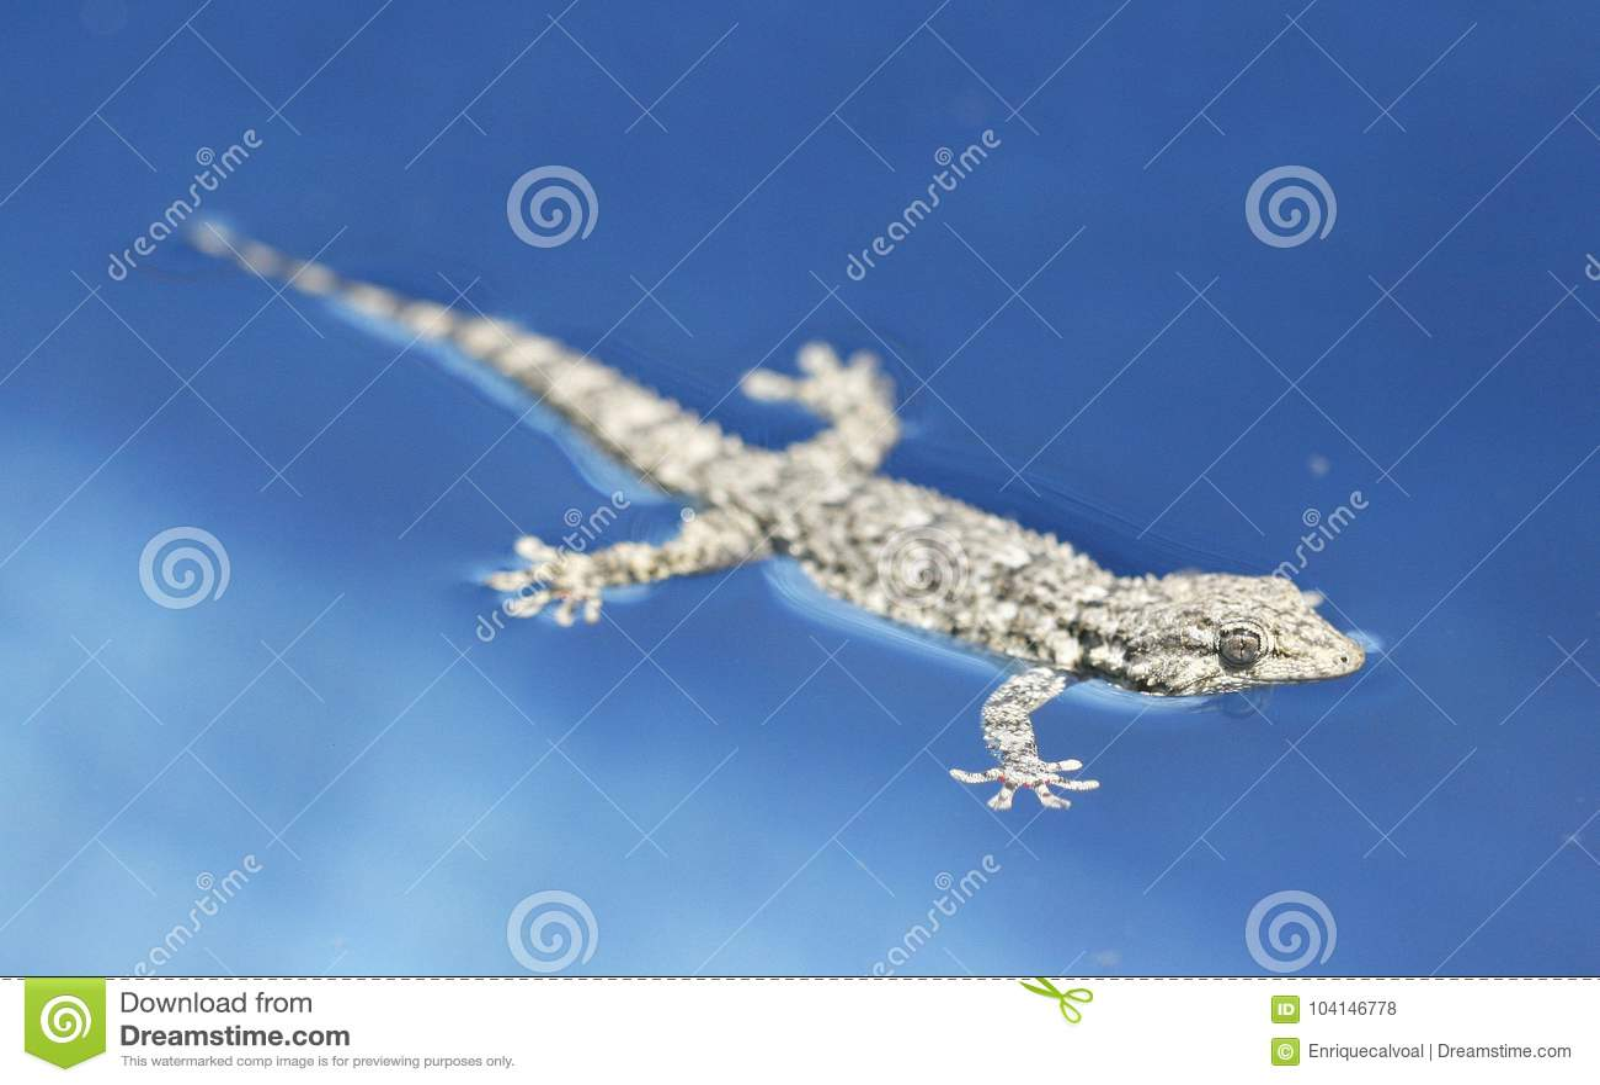 Mediterranean Tarentola mauritanica lizard floating in water pool